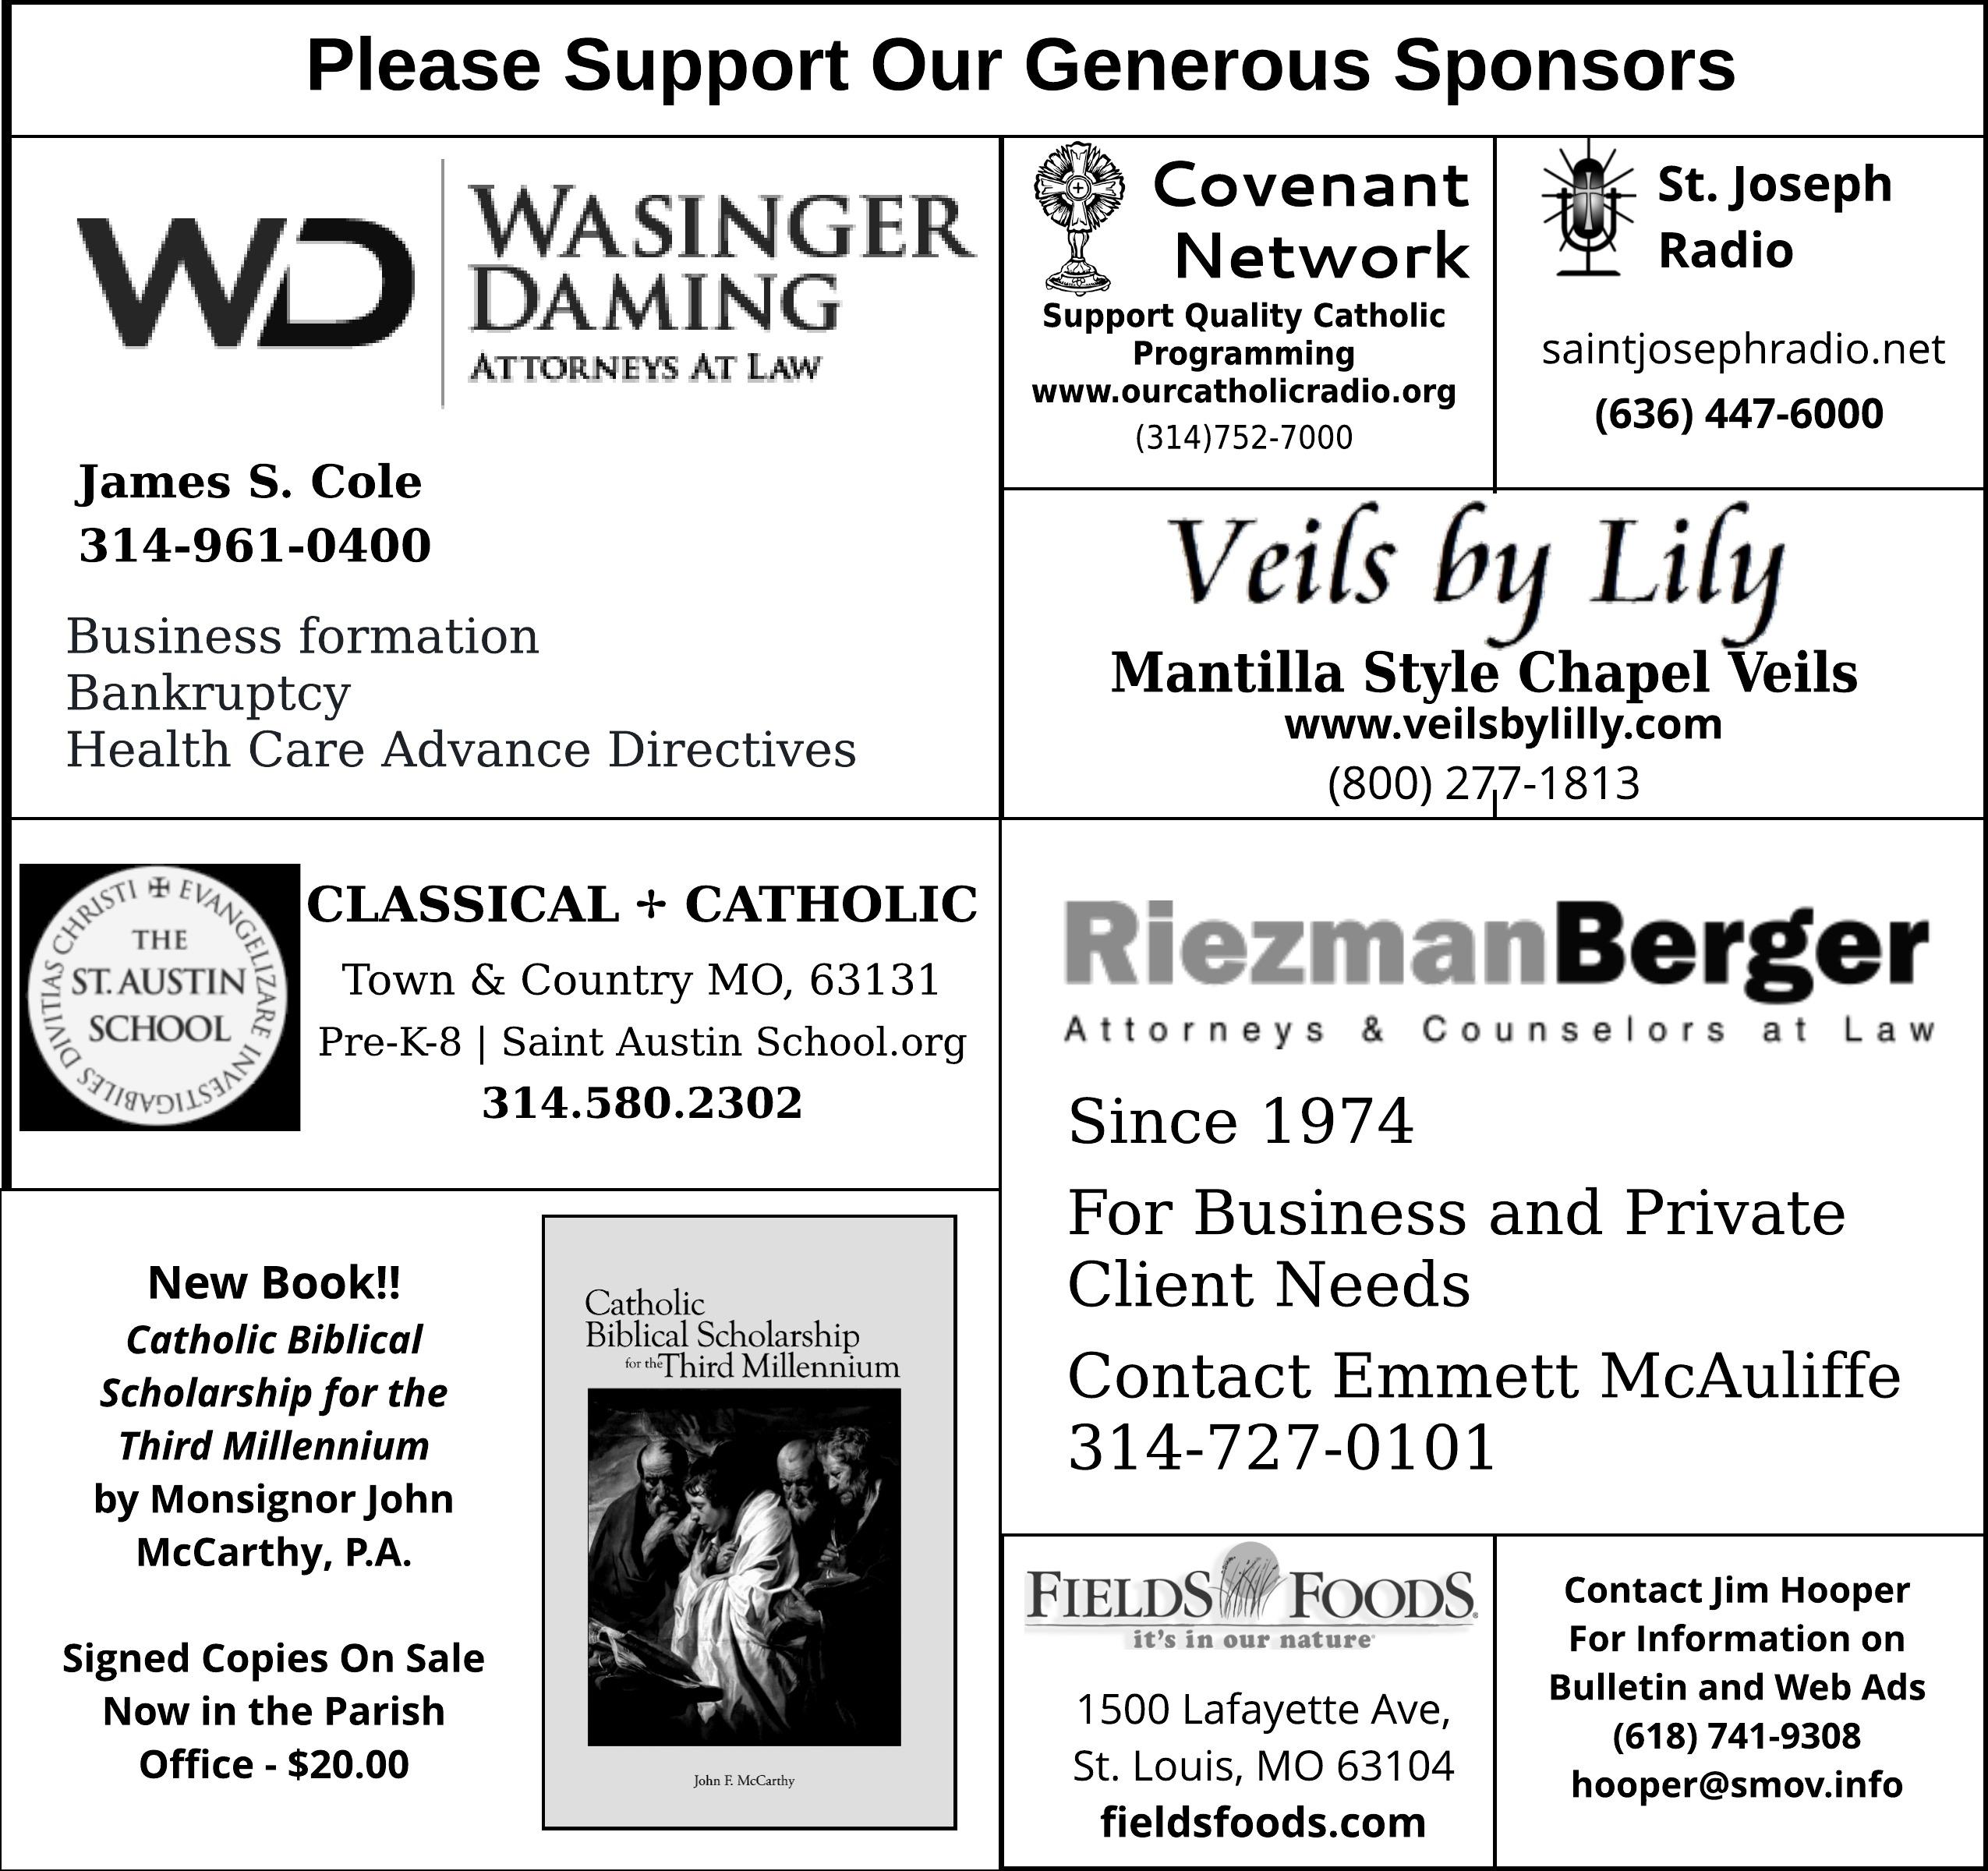 Our Generous Sponsors